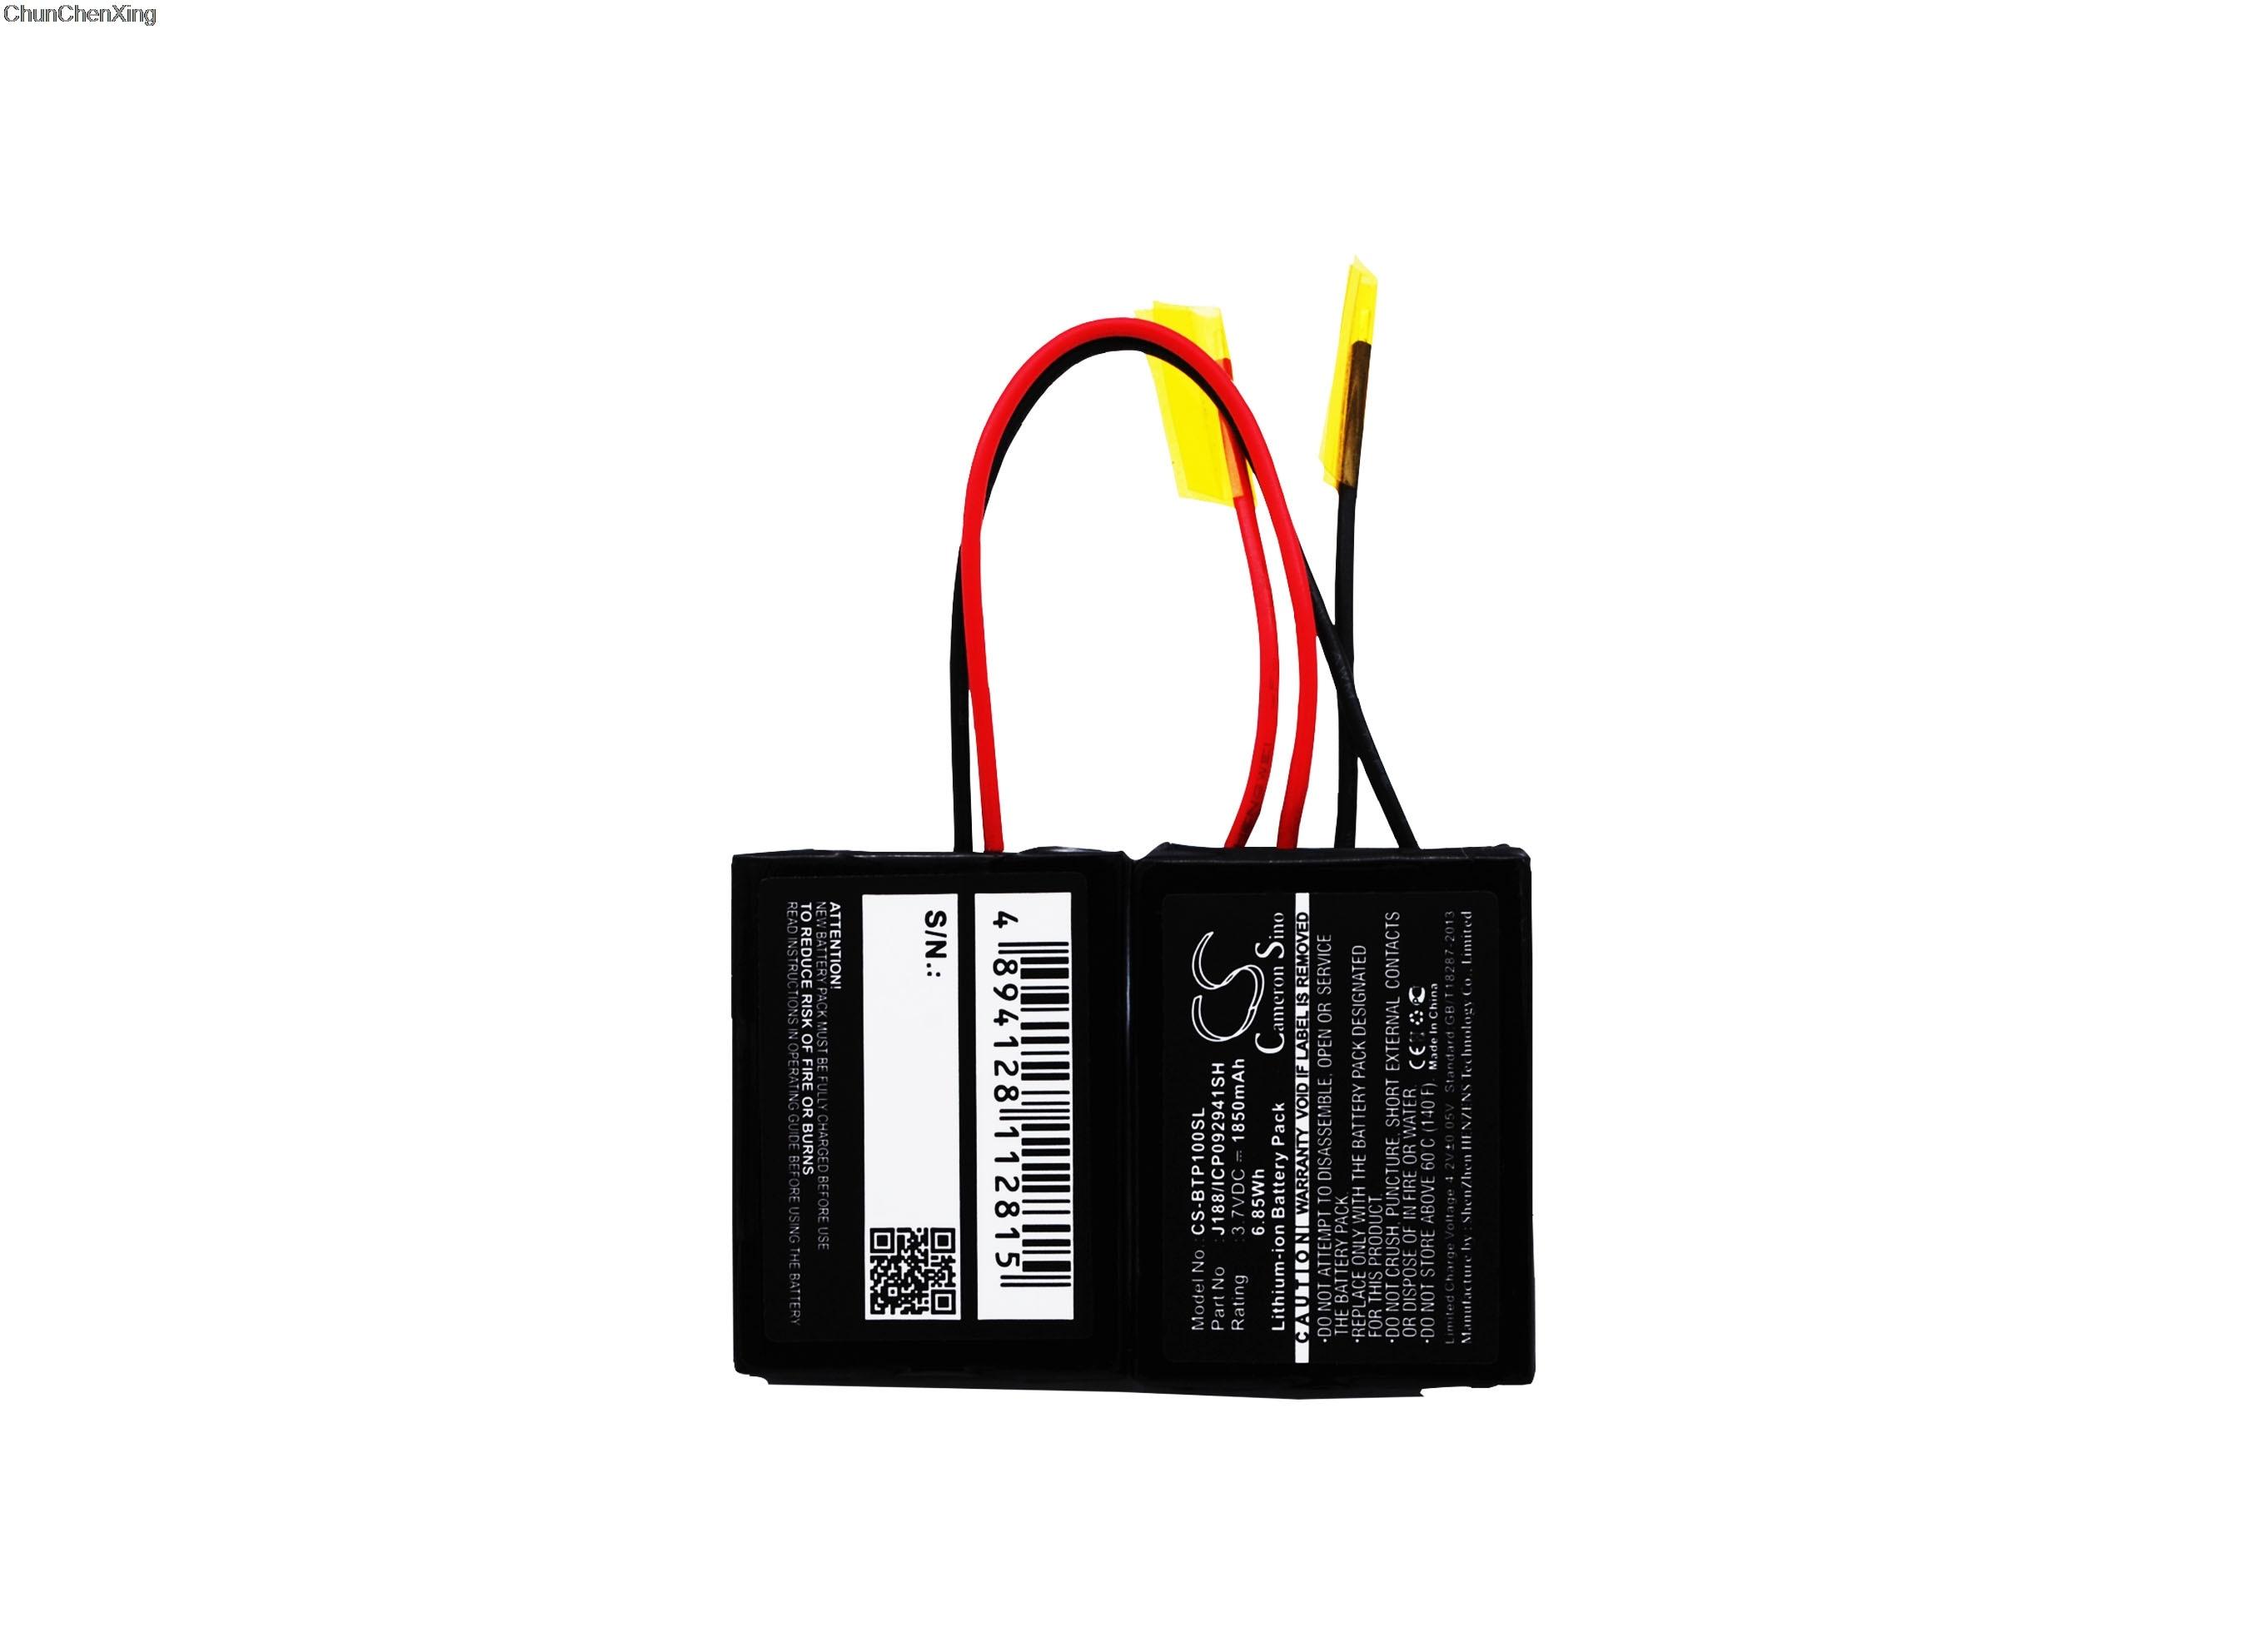 Batterie 3060mAh type 707-00008-00B 85713-00 Pour Trimble Juno 3 3B 3A